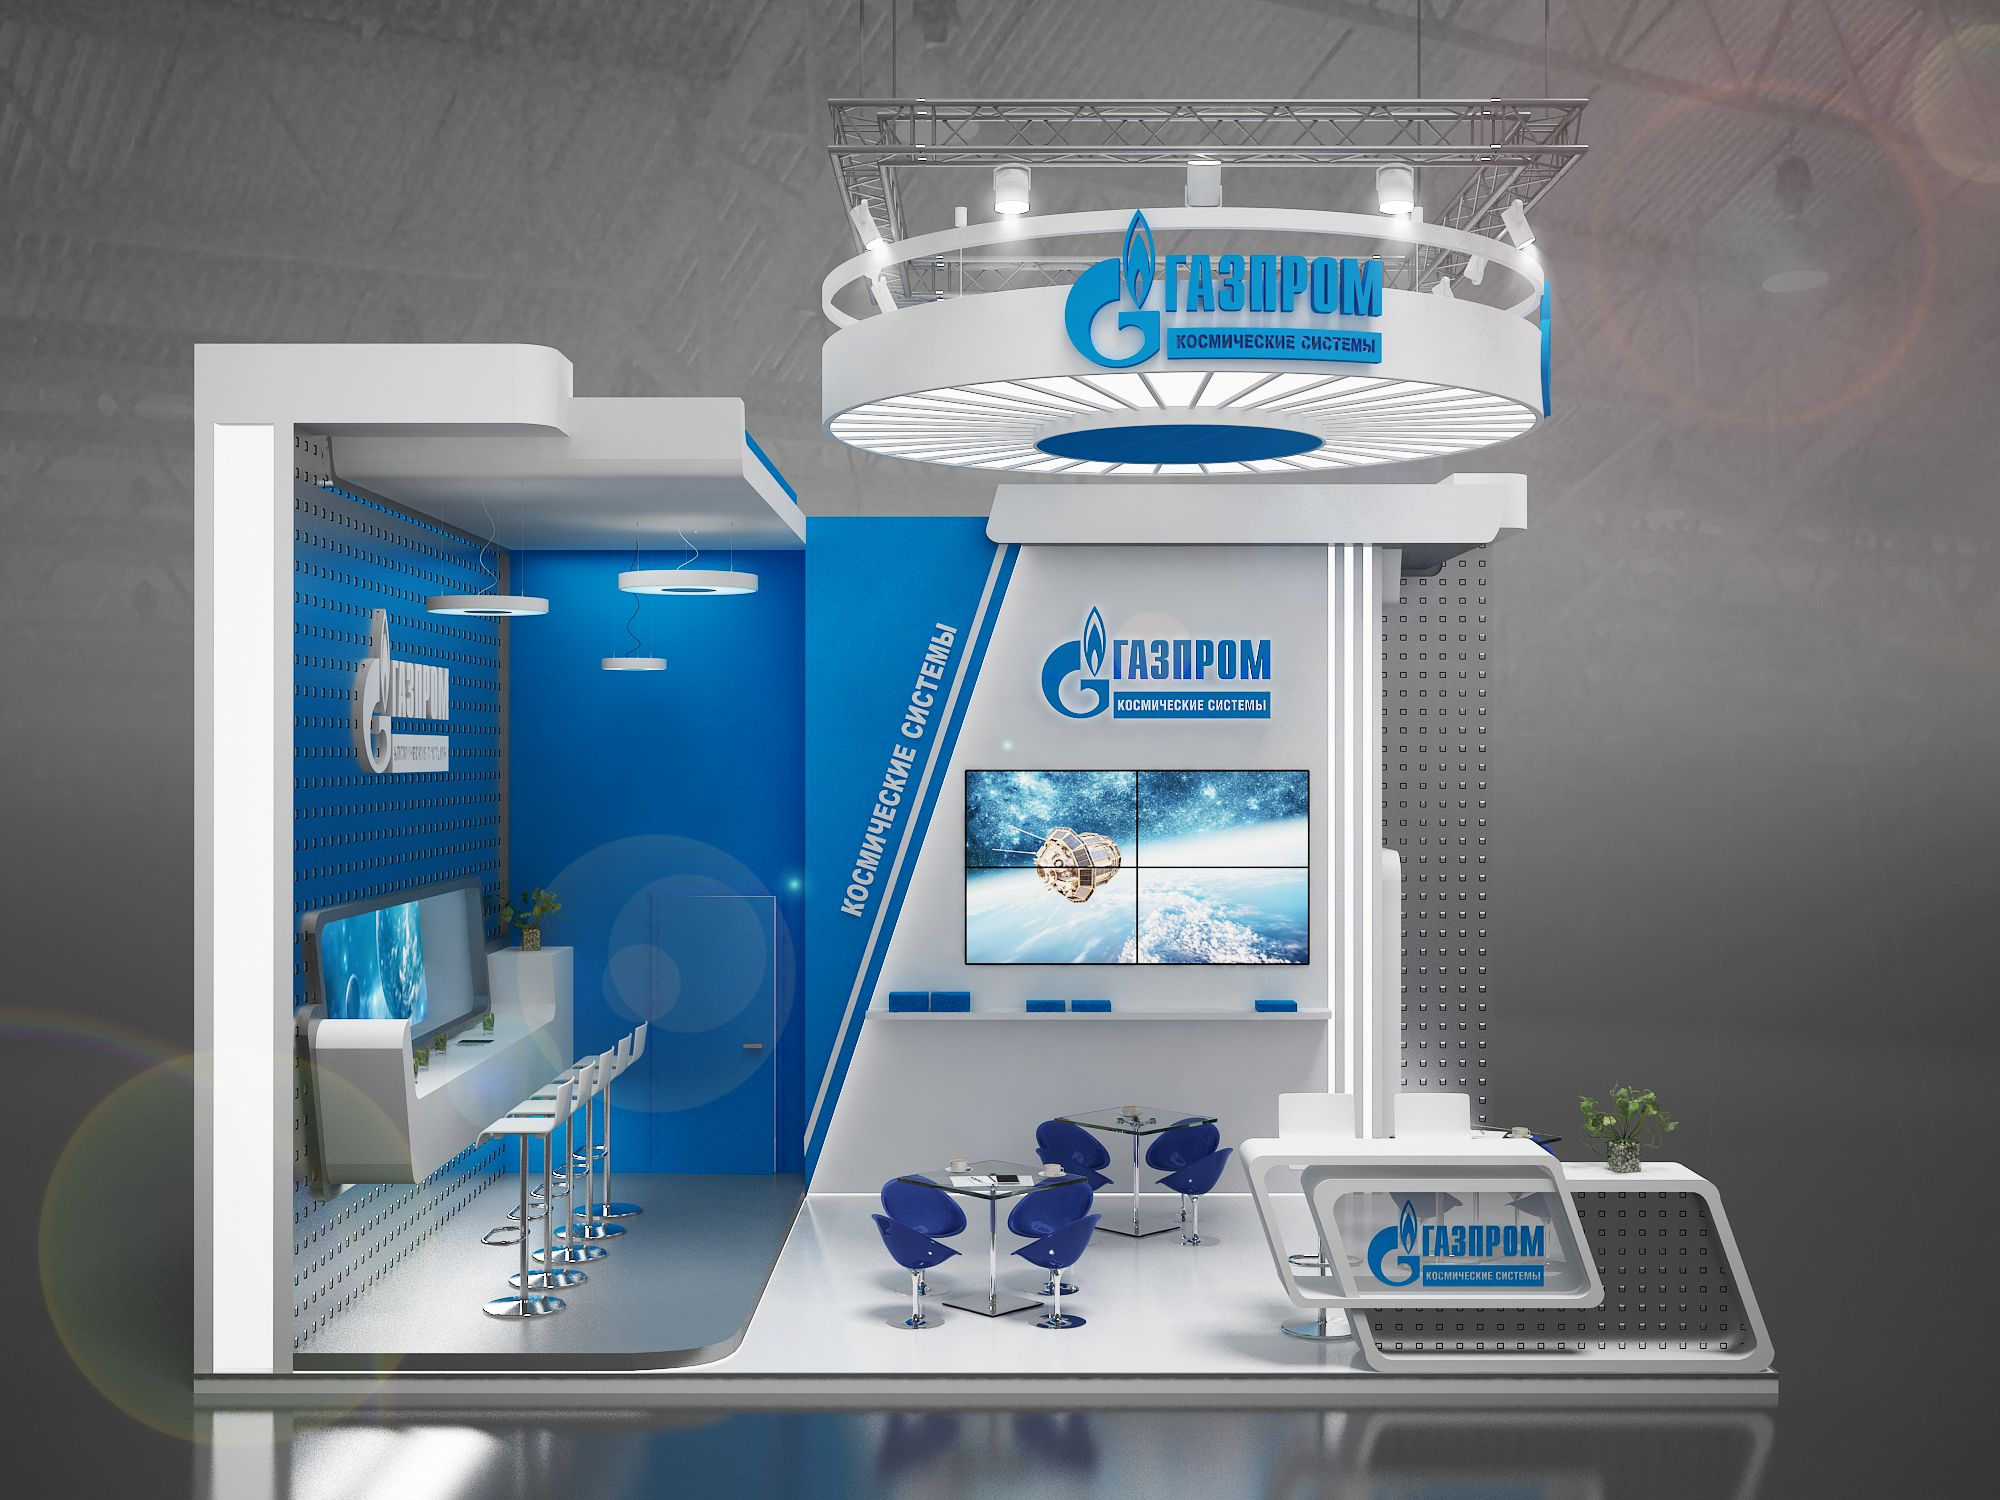 Exhibition Stall Reference : Exhibition stand ГАЗПРОМ Космические системы gxgroup